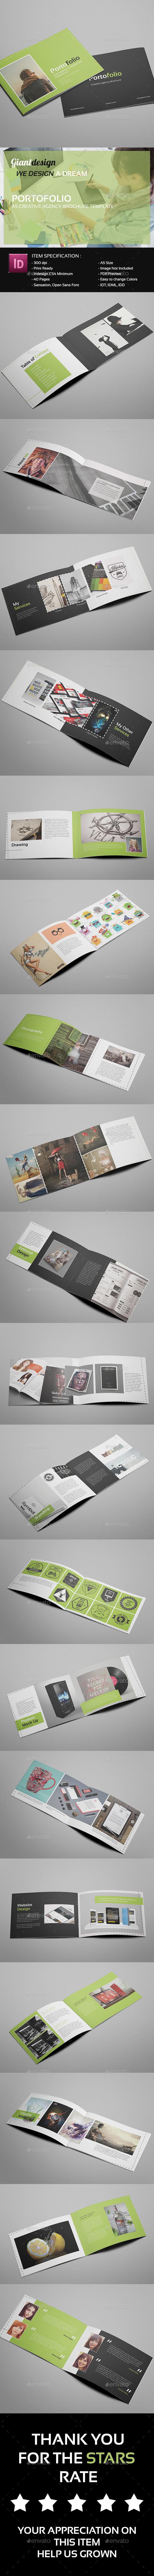 GraphicRiver Portofolio Creative Agency Brochure 11523367